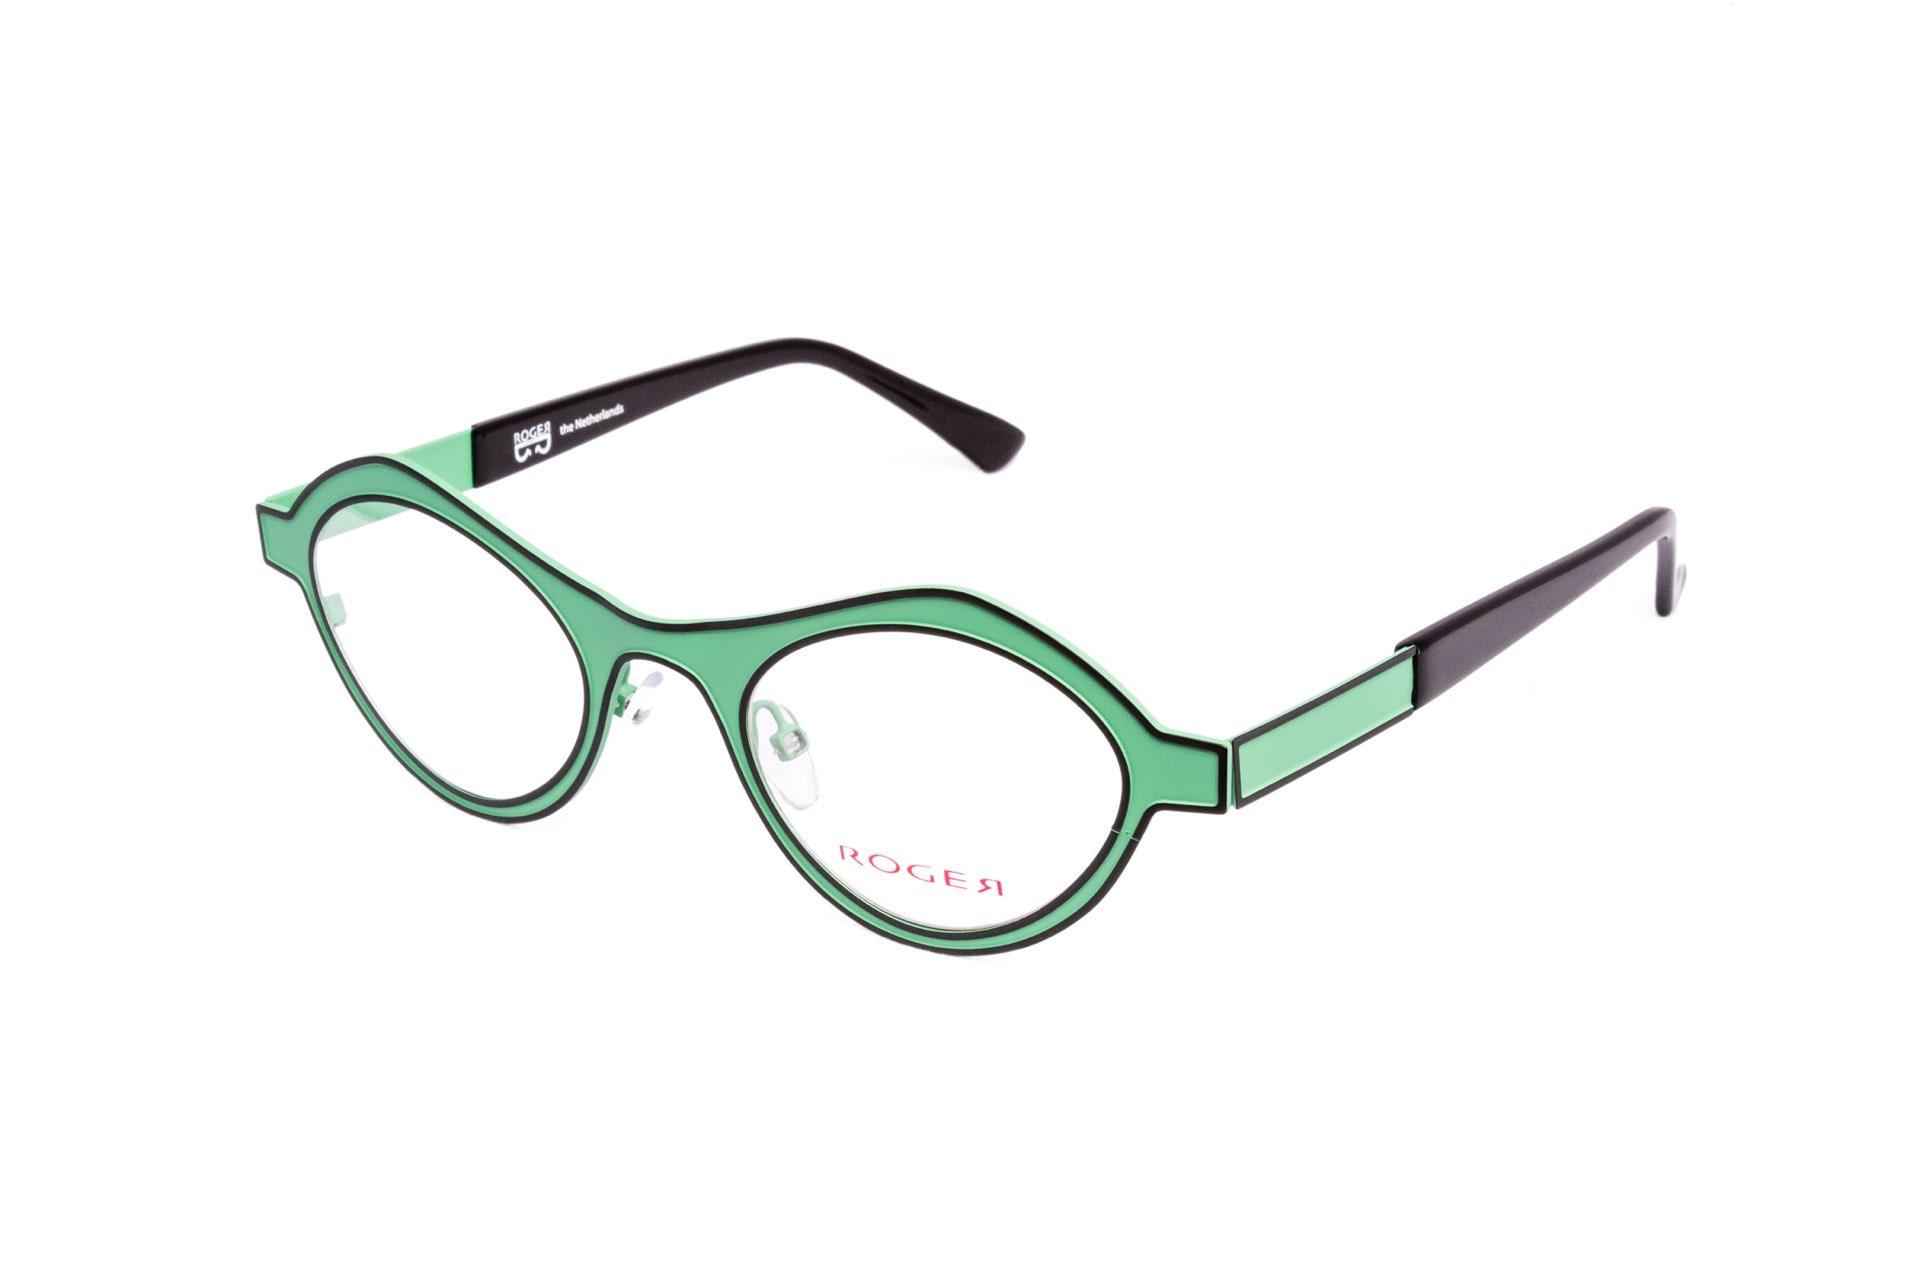 Roger Eyewear Design Glasses Boca Raton